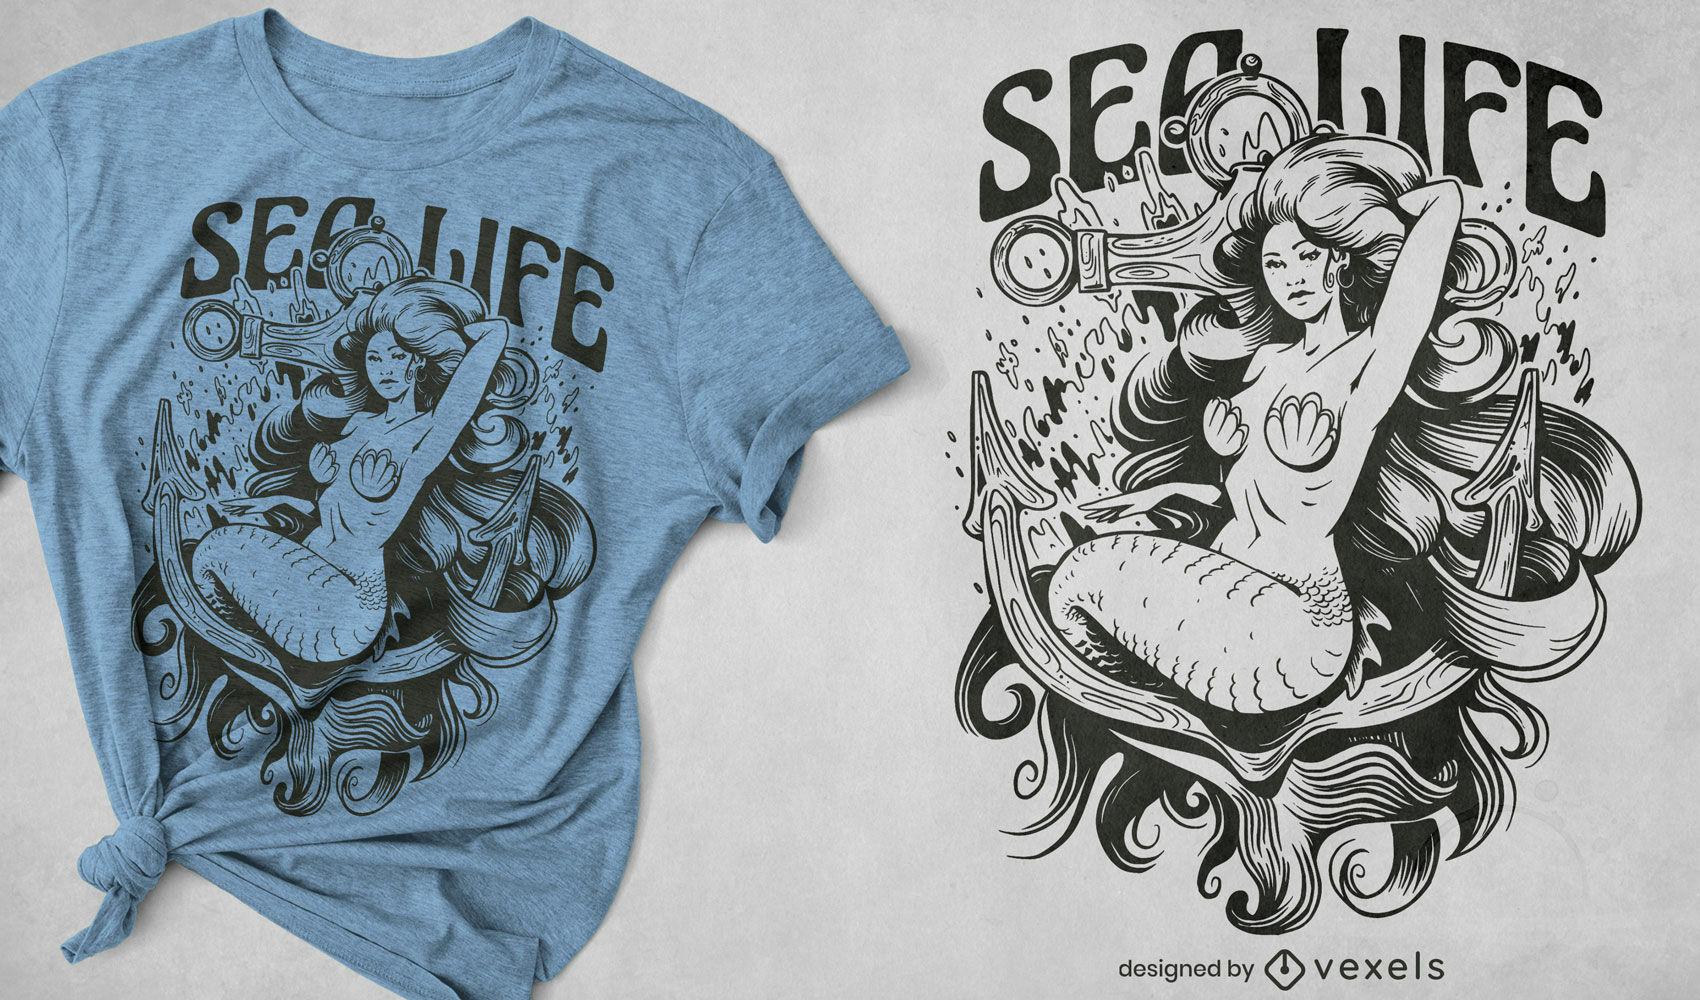 Mythological mermaid on anchor t-shirt design